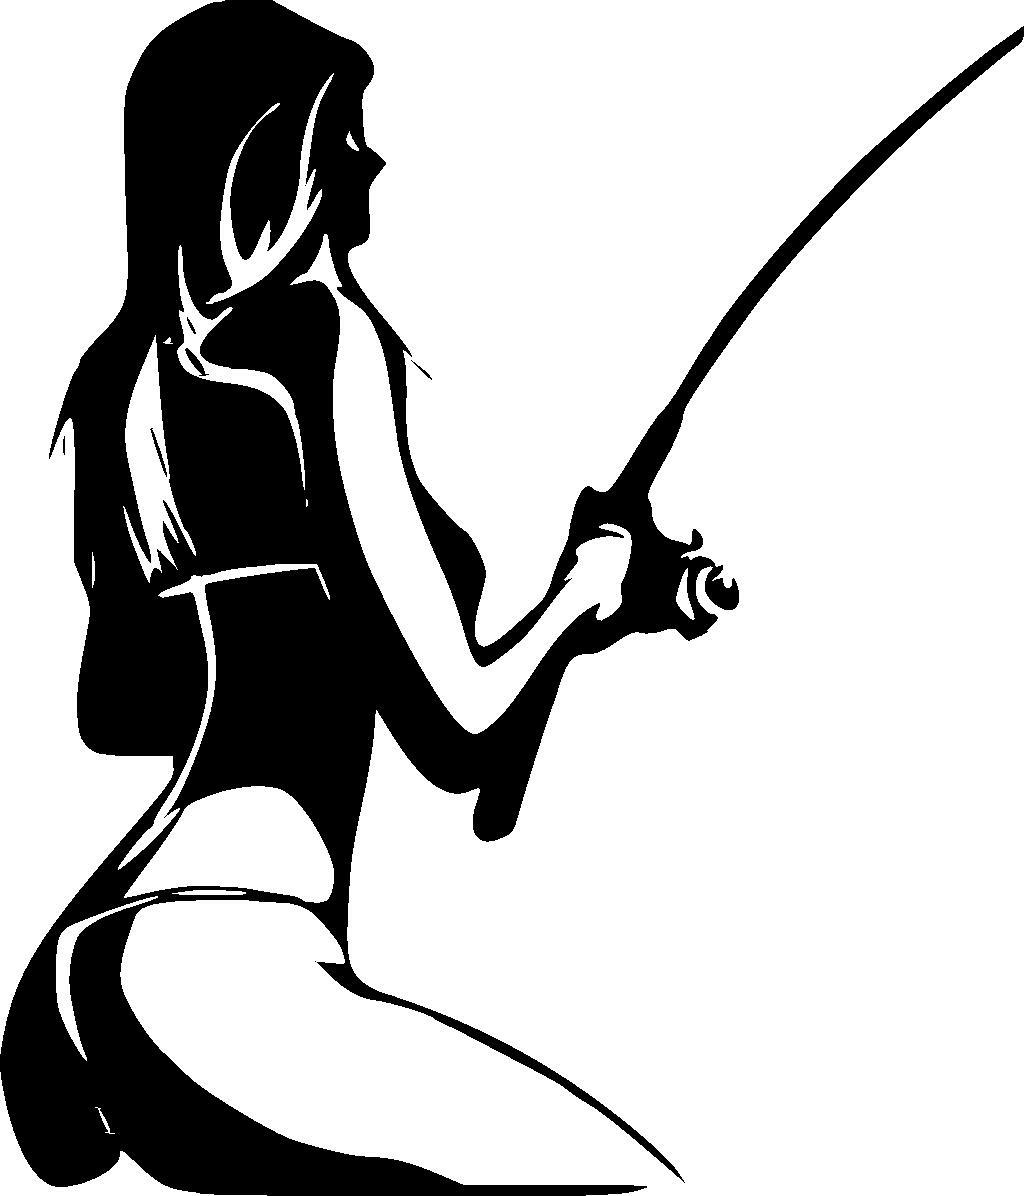 1024x1196 Hot Girl Fishing Decal Bizzytop Apparel Clothing For Fishing